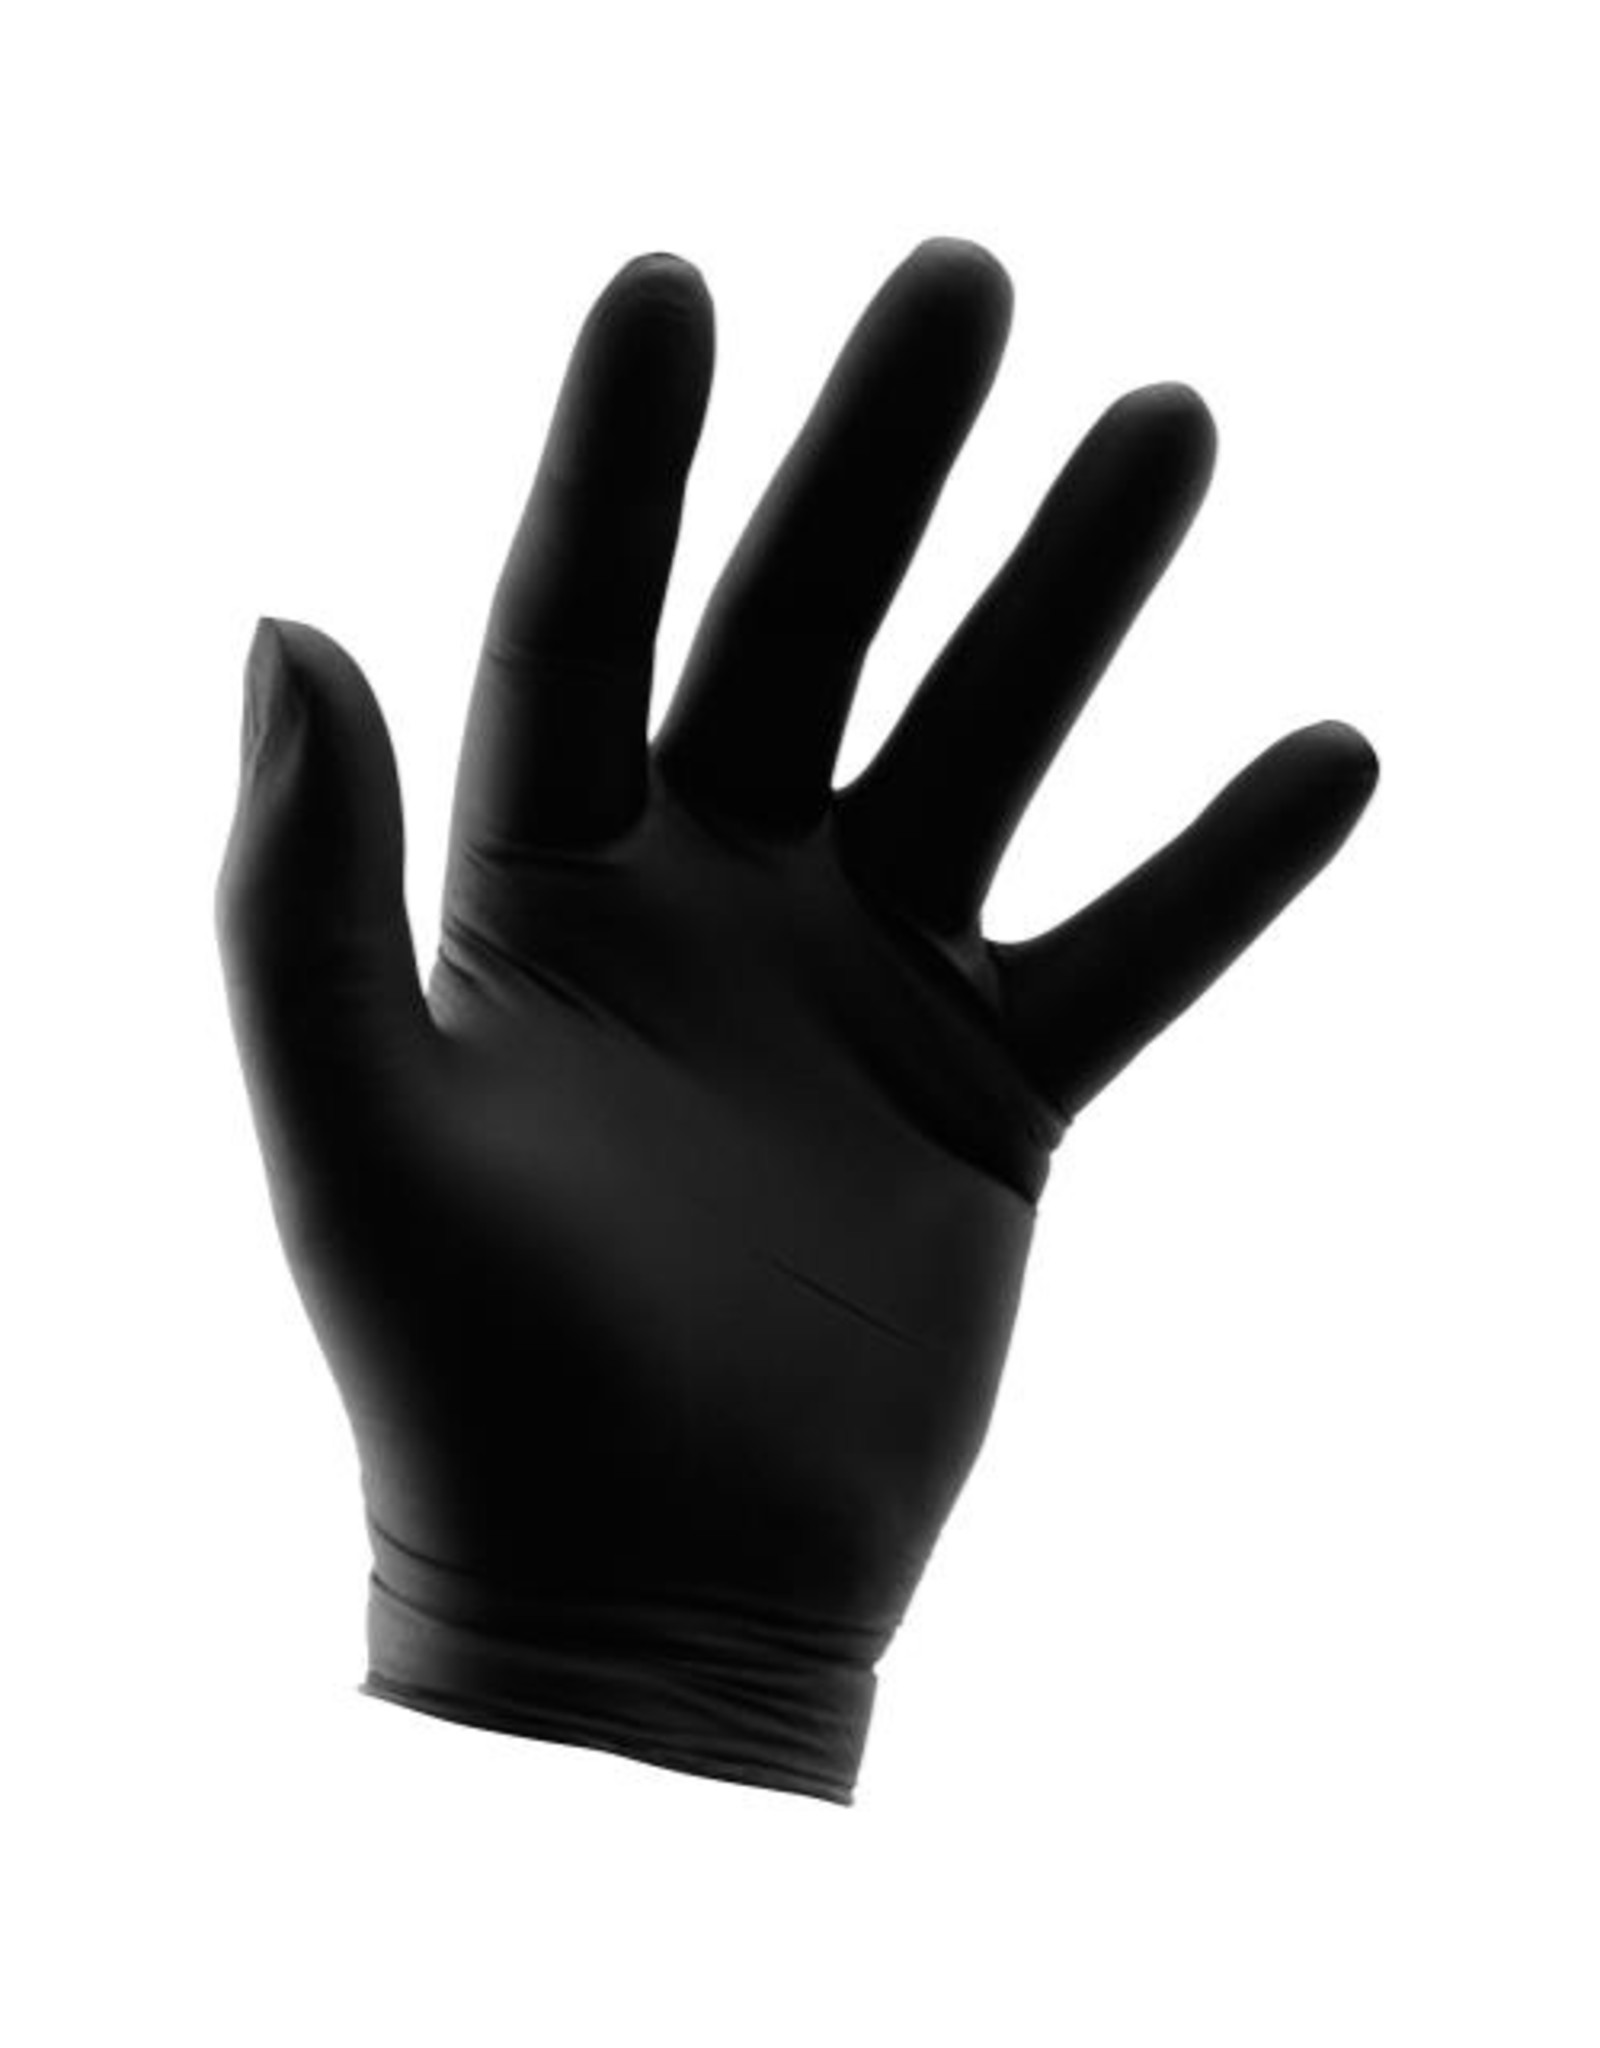 Grower's Edge Black Nitrile Gloves - Large